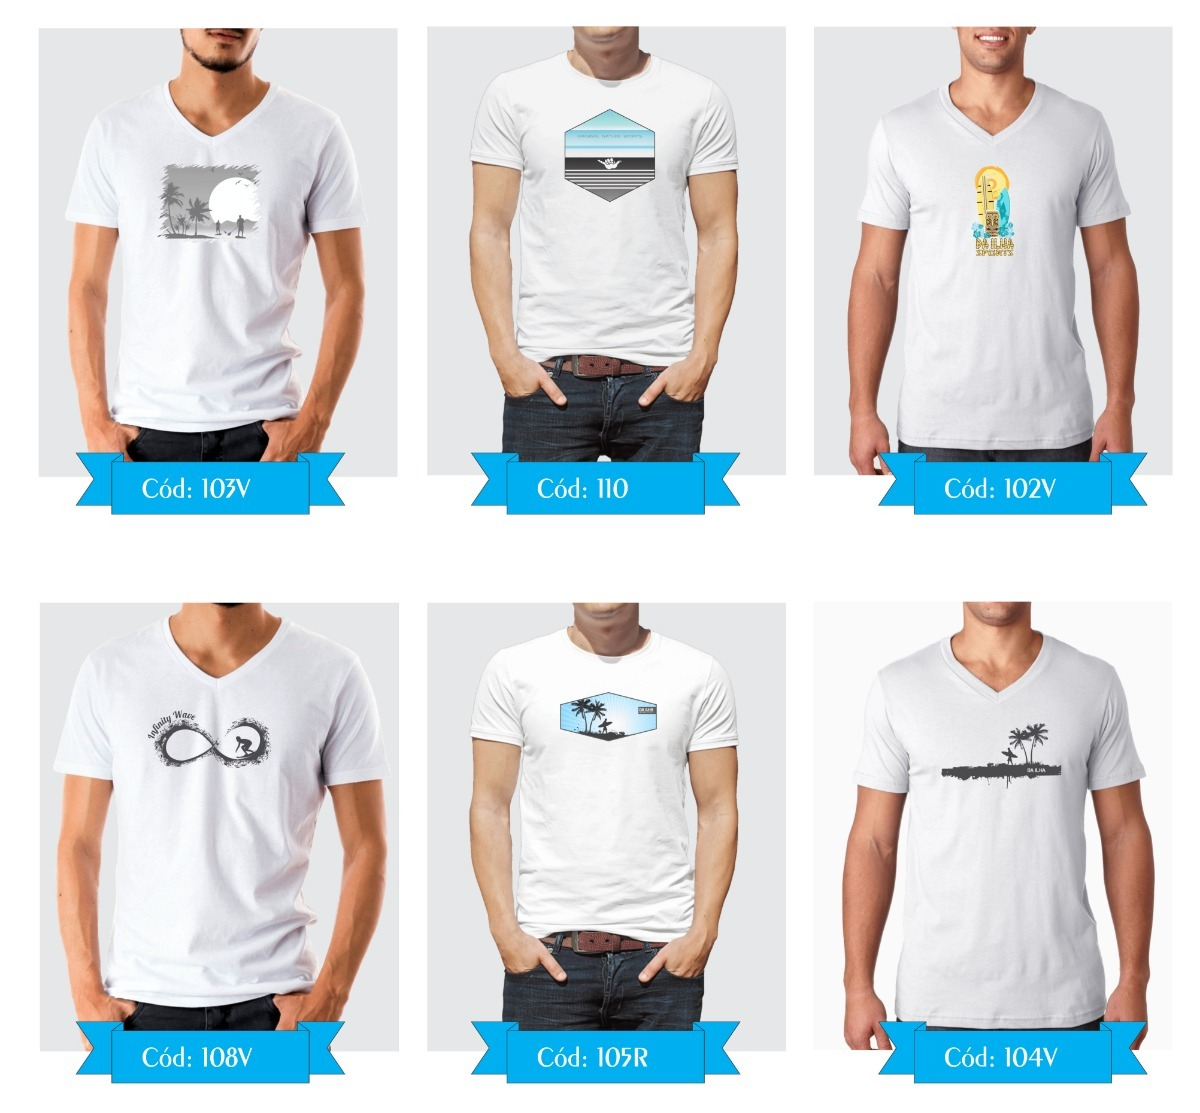 02e782cc87 kit combo 3 camiseta masculina surf camisa blusa original. Carregando zoom.